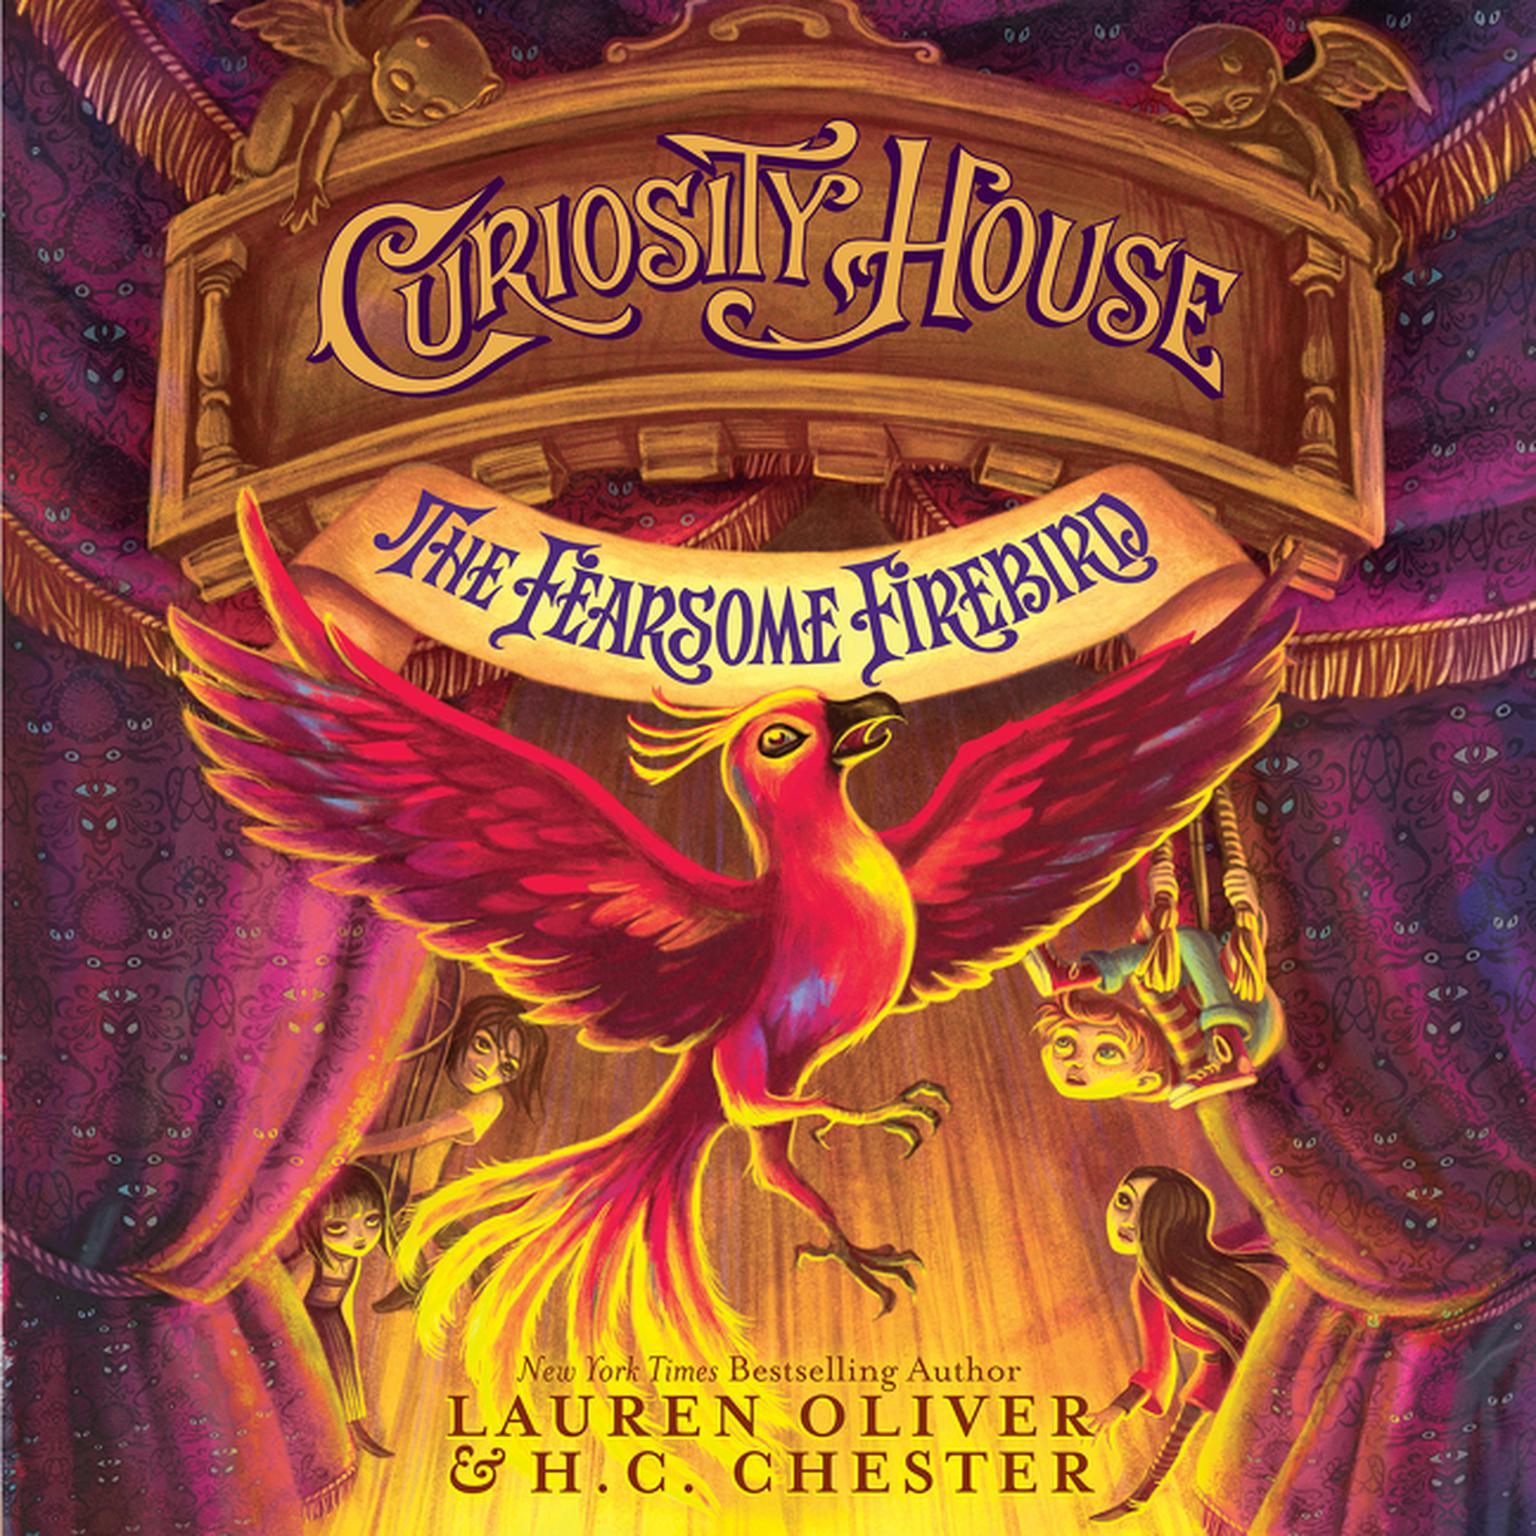 Printable Curiosity House: The Fearsome Firebird Audiobook Cover Art